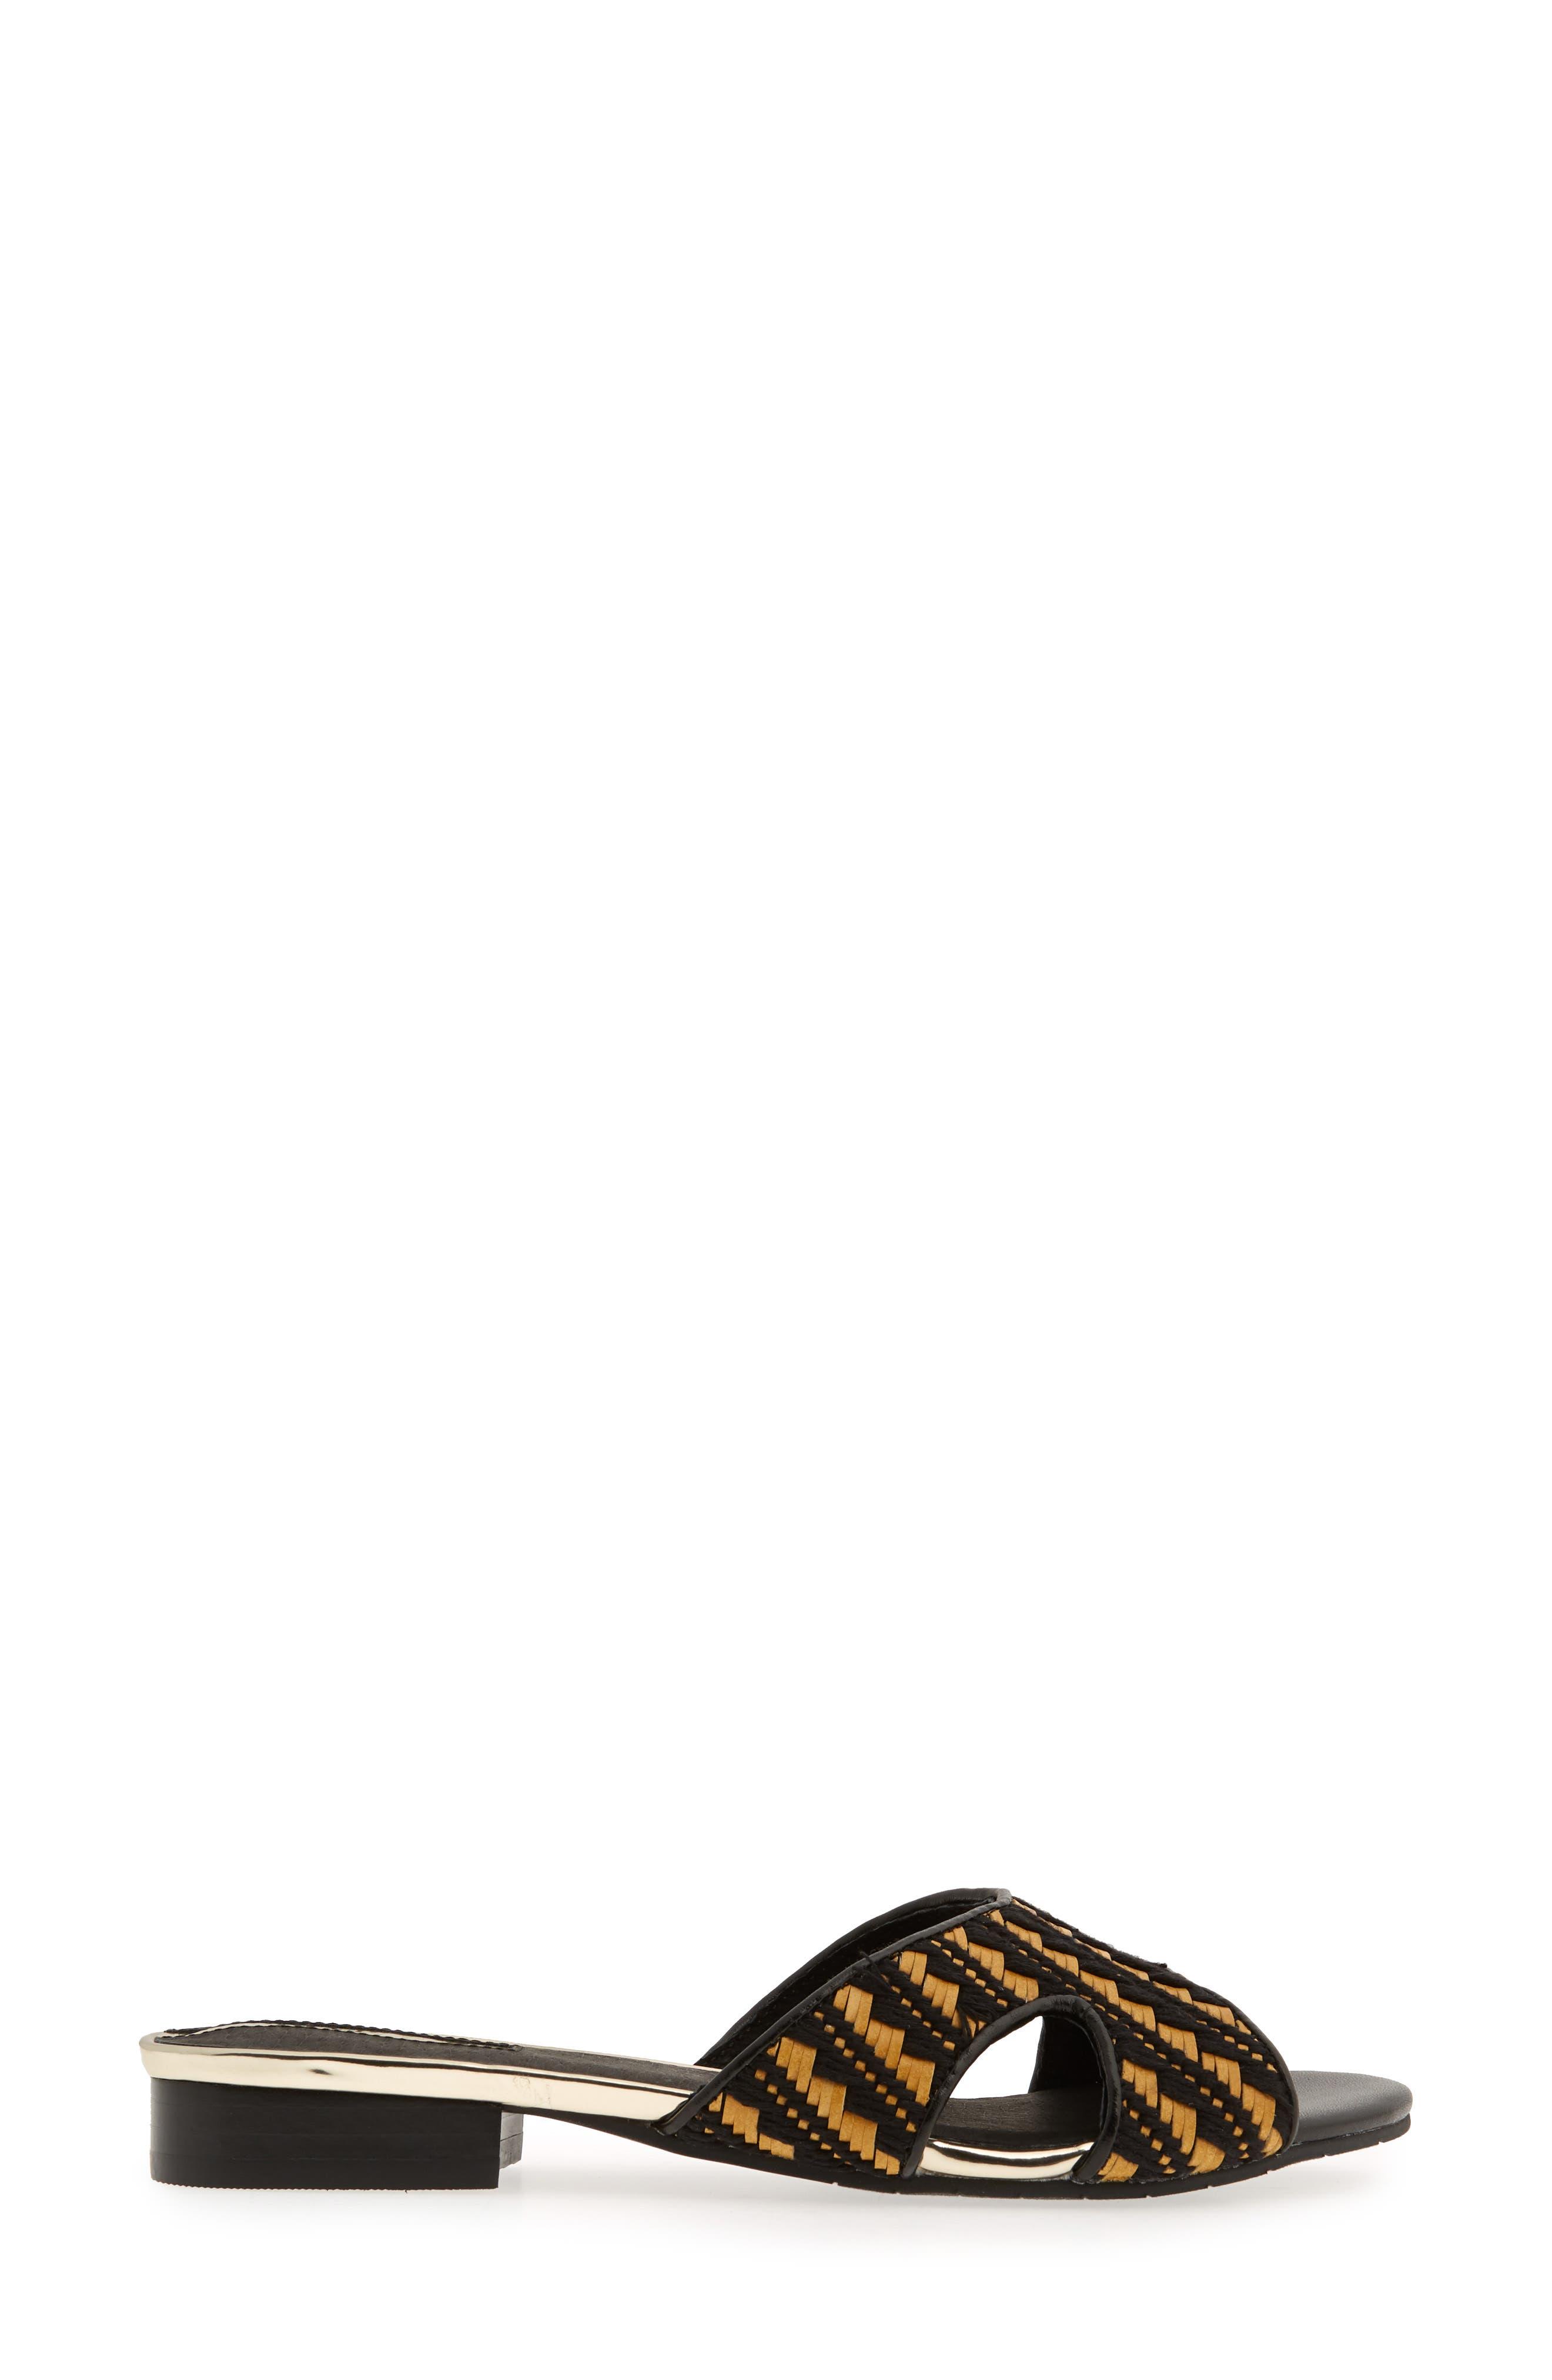 Viveca 2 Slide Sandal,                             Alternate thumbnail 3, color,                             Black/ Natural Fabric